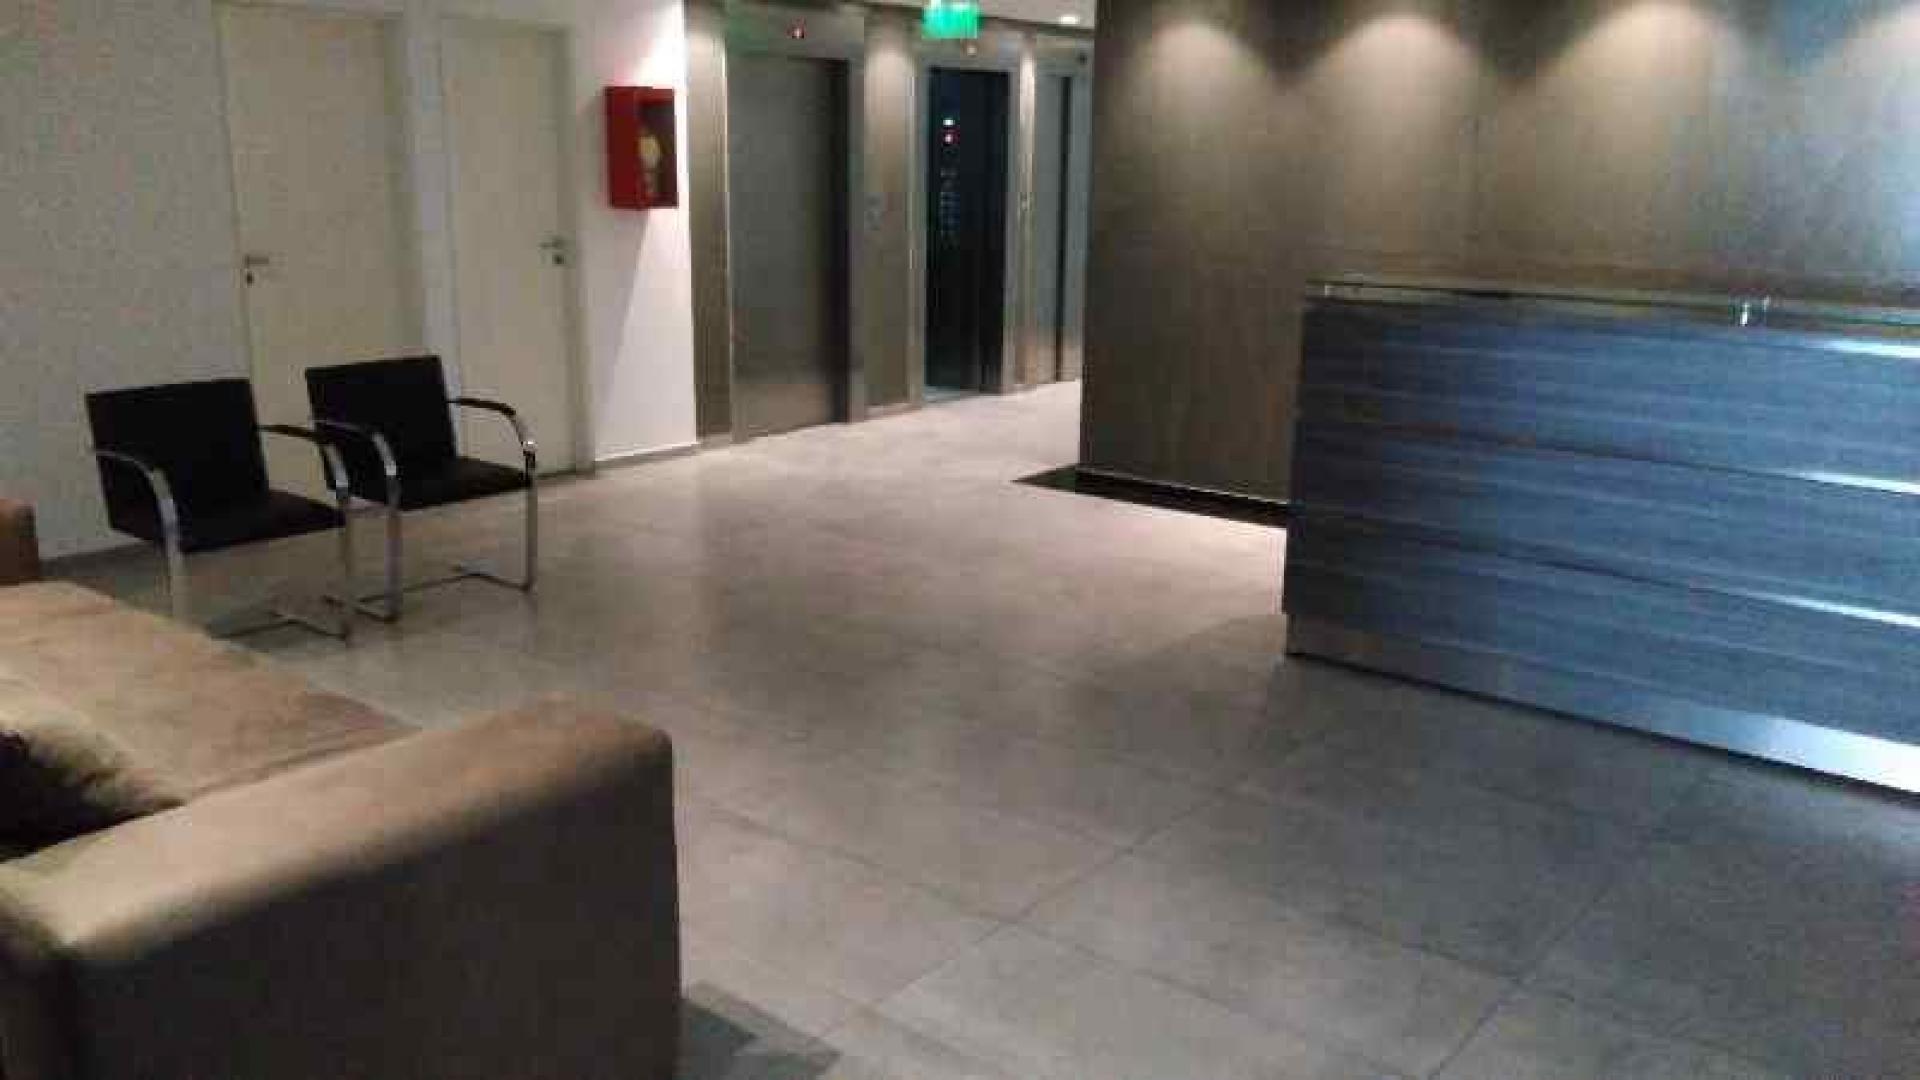 La Rioja 400 - $ 4.000 - Oficina Alquiler